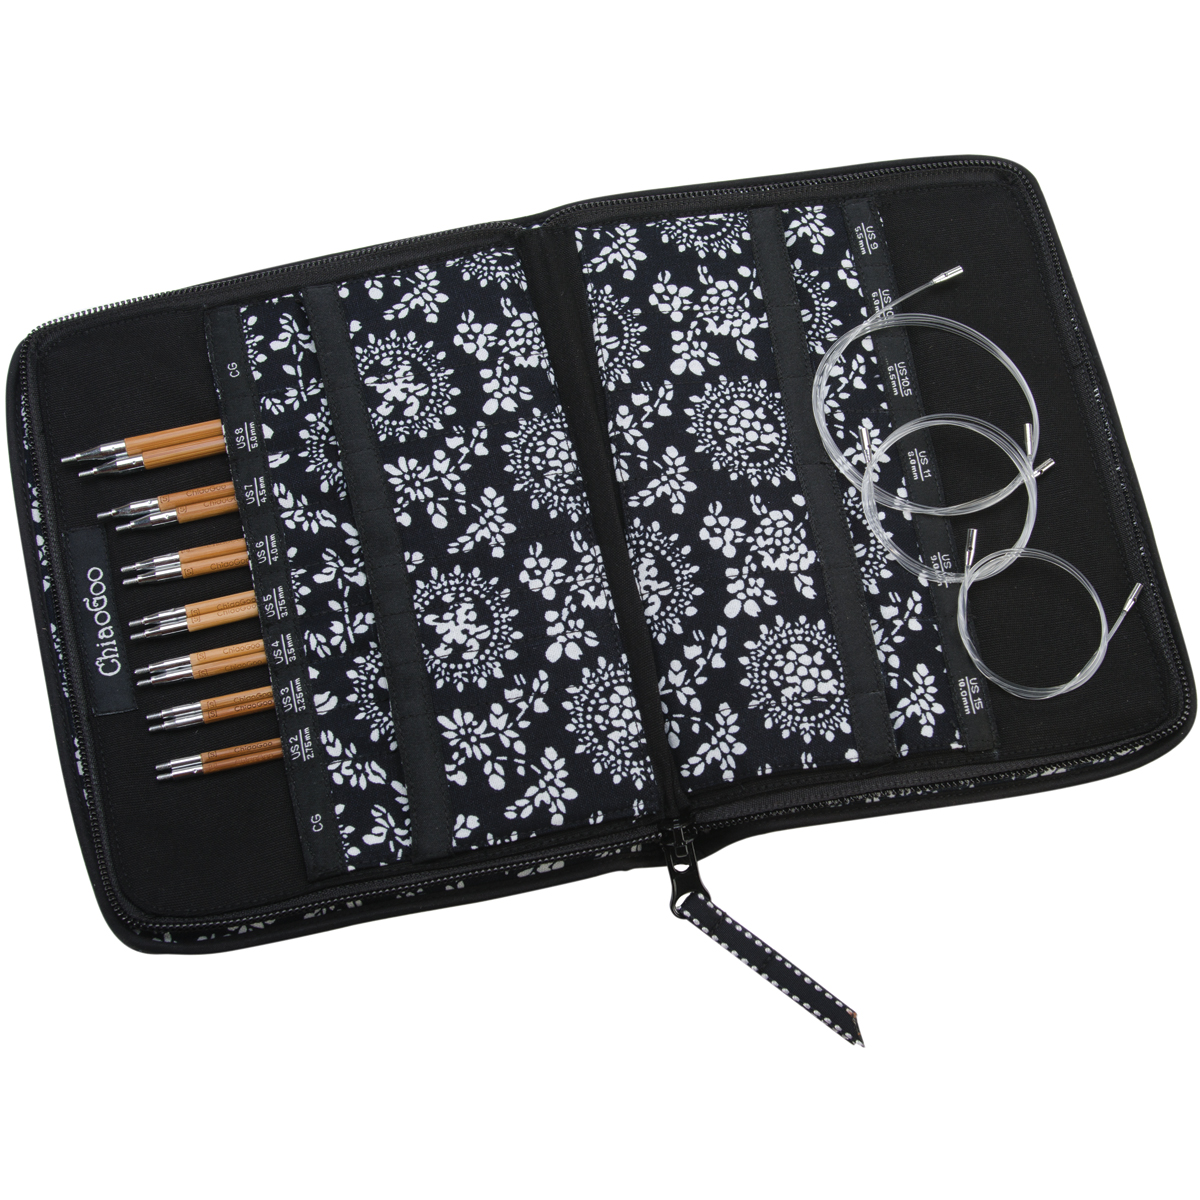 ChiaoGoo SPIN Bamboo Intchg Knitting Needle 5 Tip Set-Small